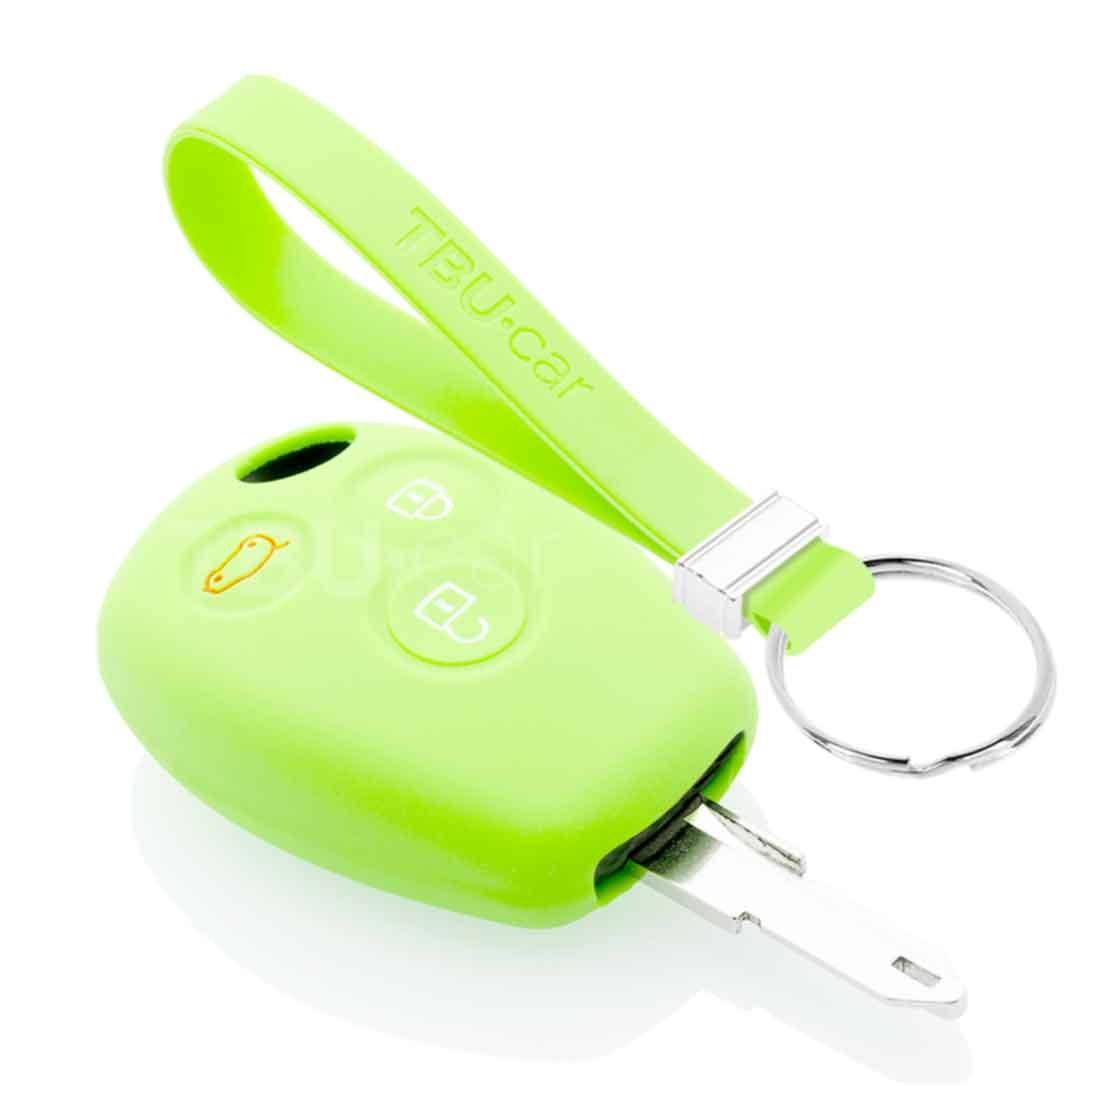 TBU car TBU car Car key cover compatible with Dacia - Silicone Protective Remote Key Shell - FOB Case Cover - Glow in the Dark